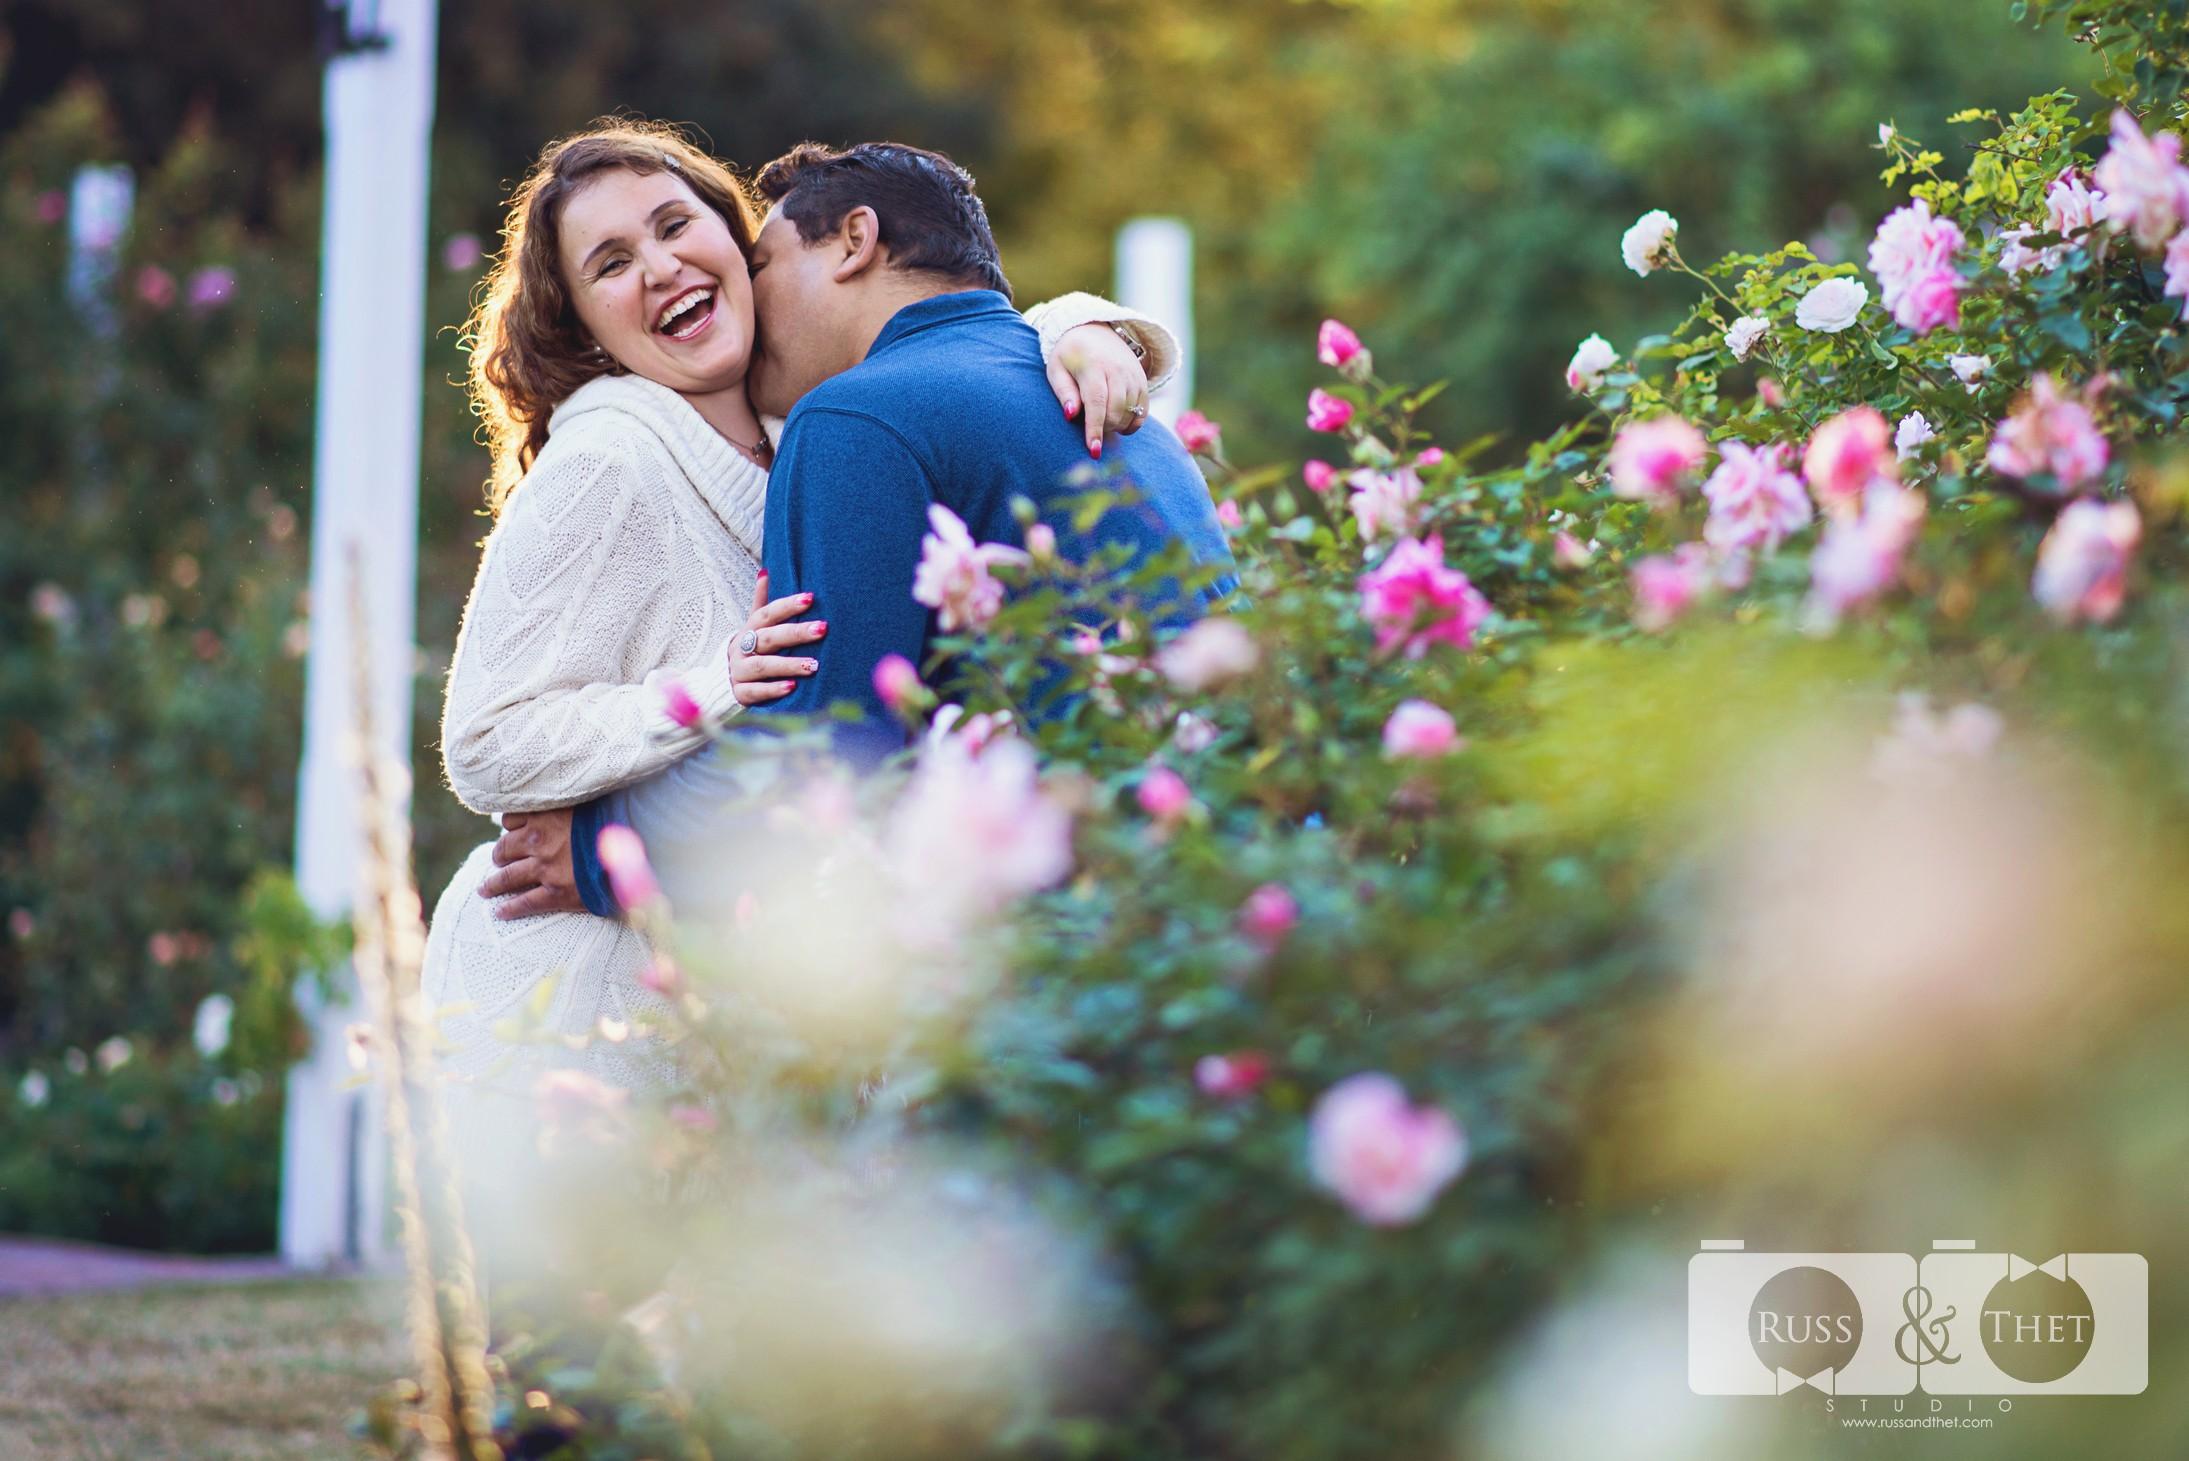 Hector&Vanessa-LA-Arboretum-Engagement-Photographer (9).jpg